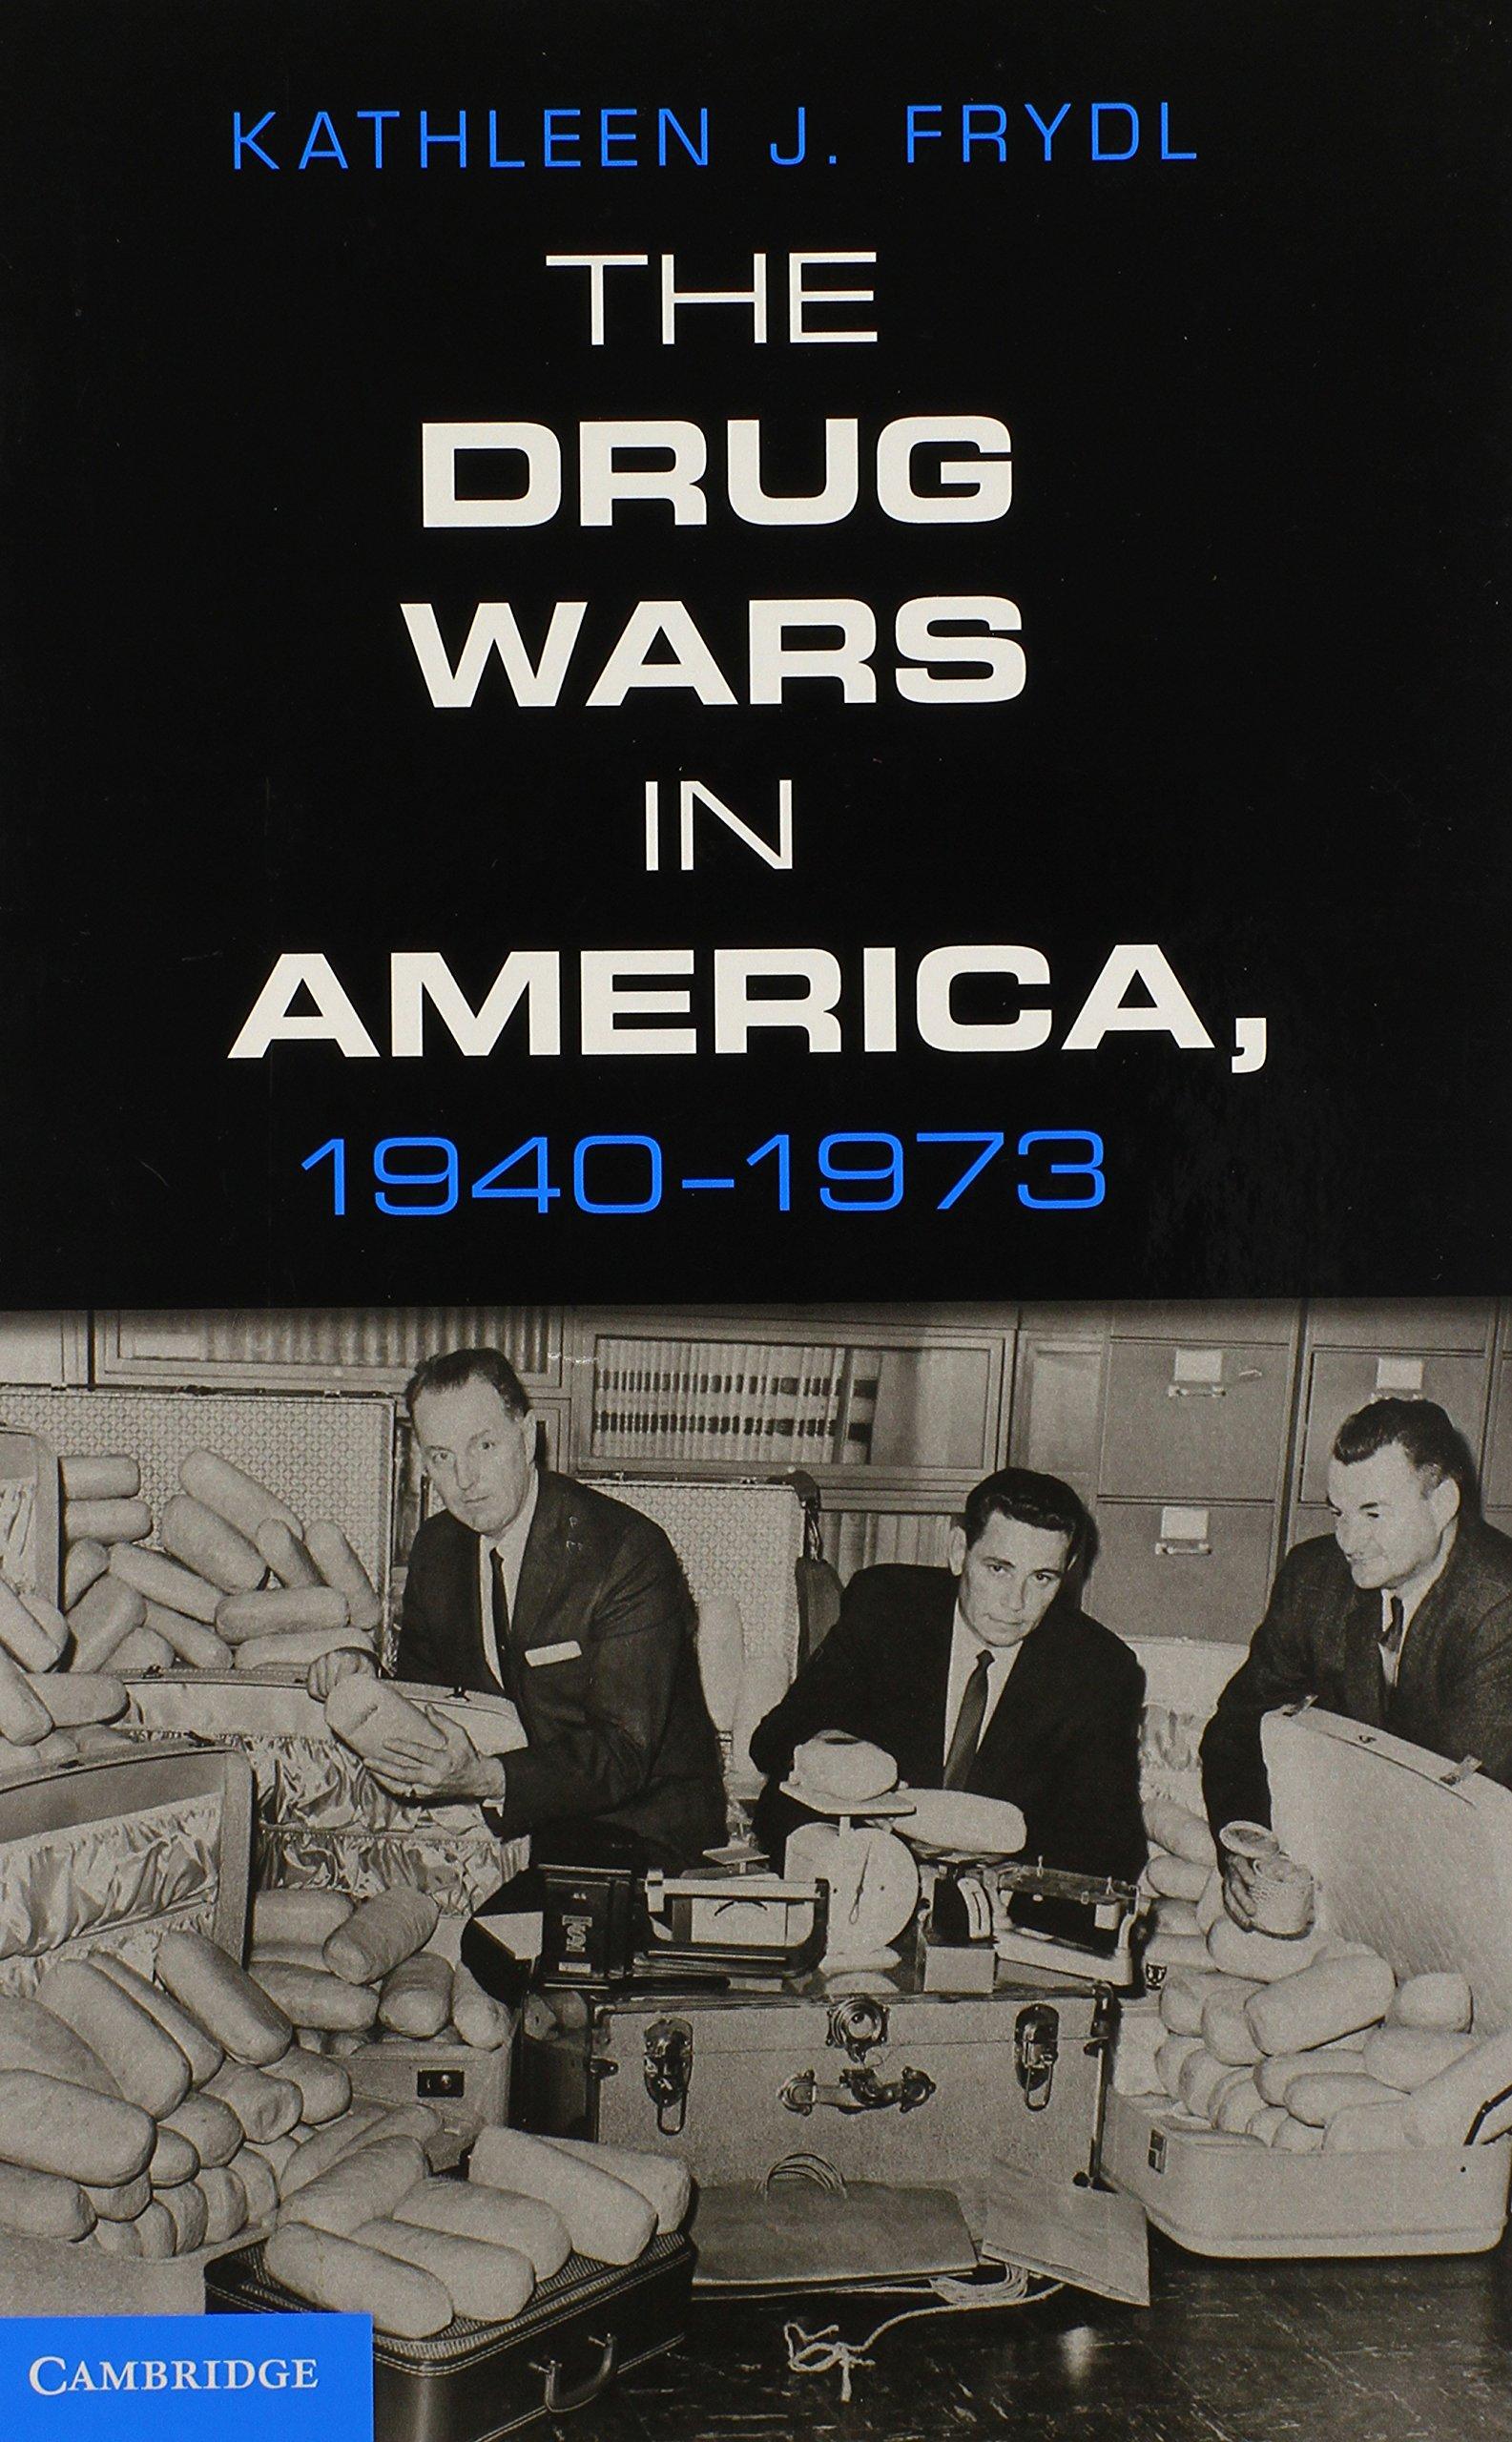 The Drug Wars in America, 1940-1973: Kathleen J. Frydl: 9781107013902:  Books - Amazon.ca